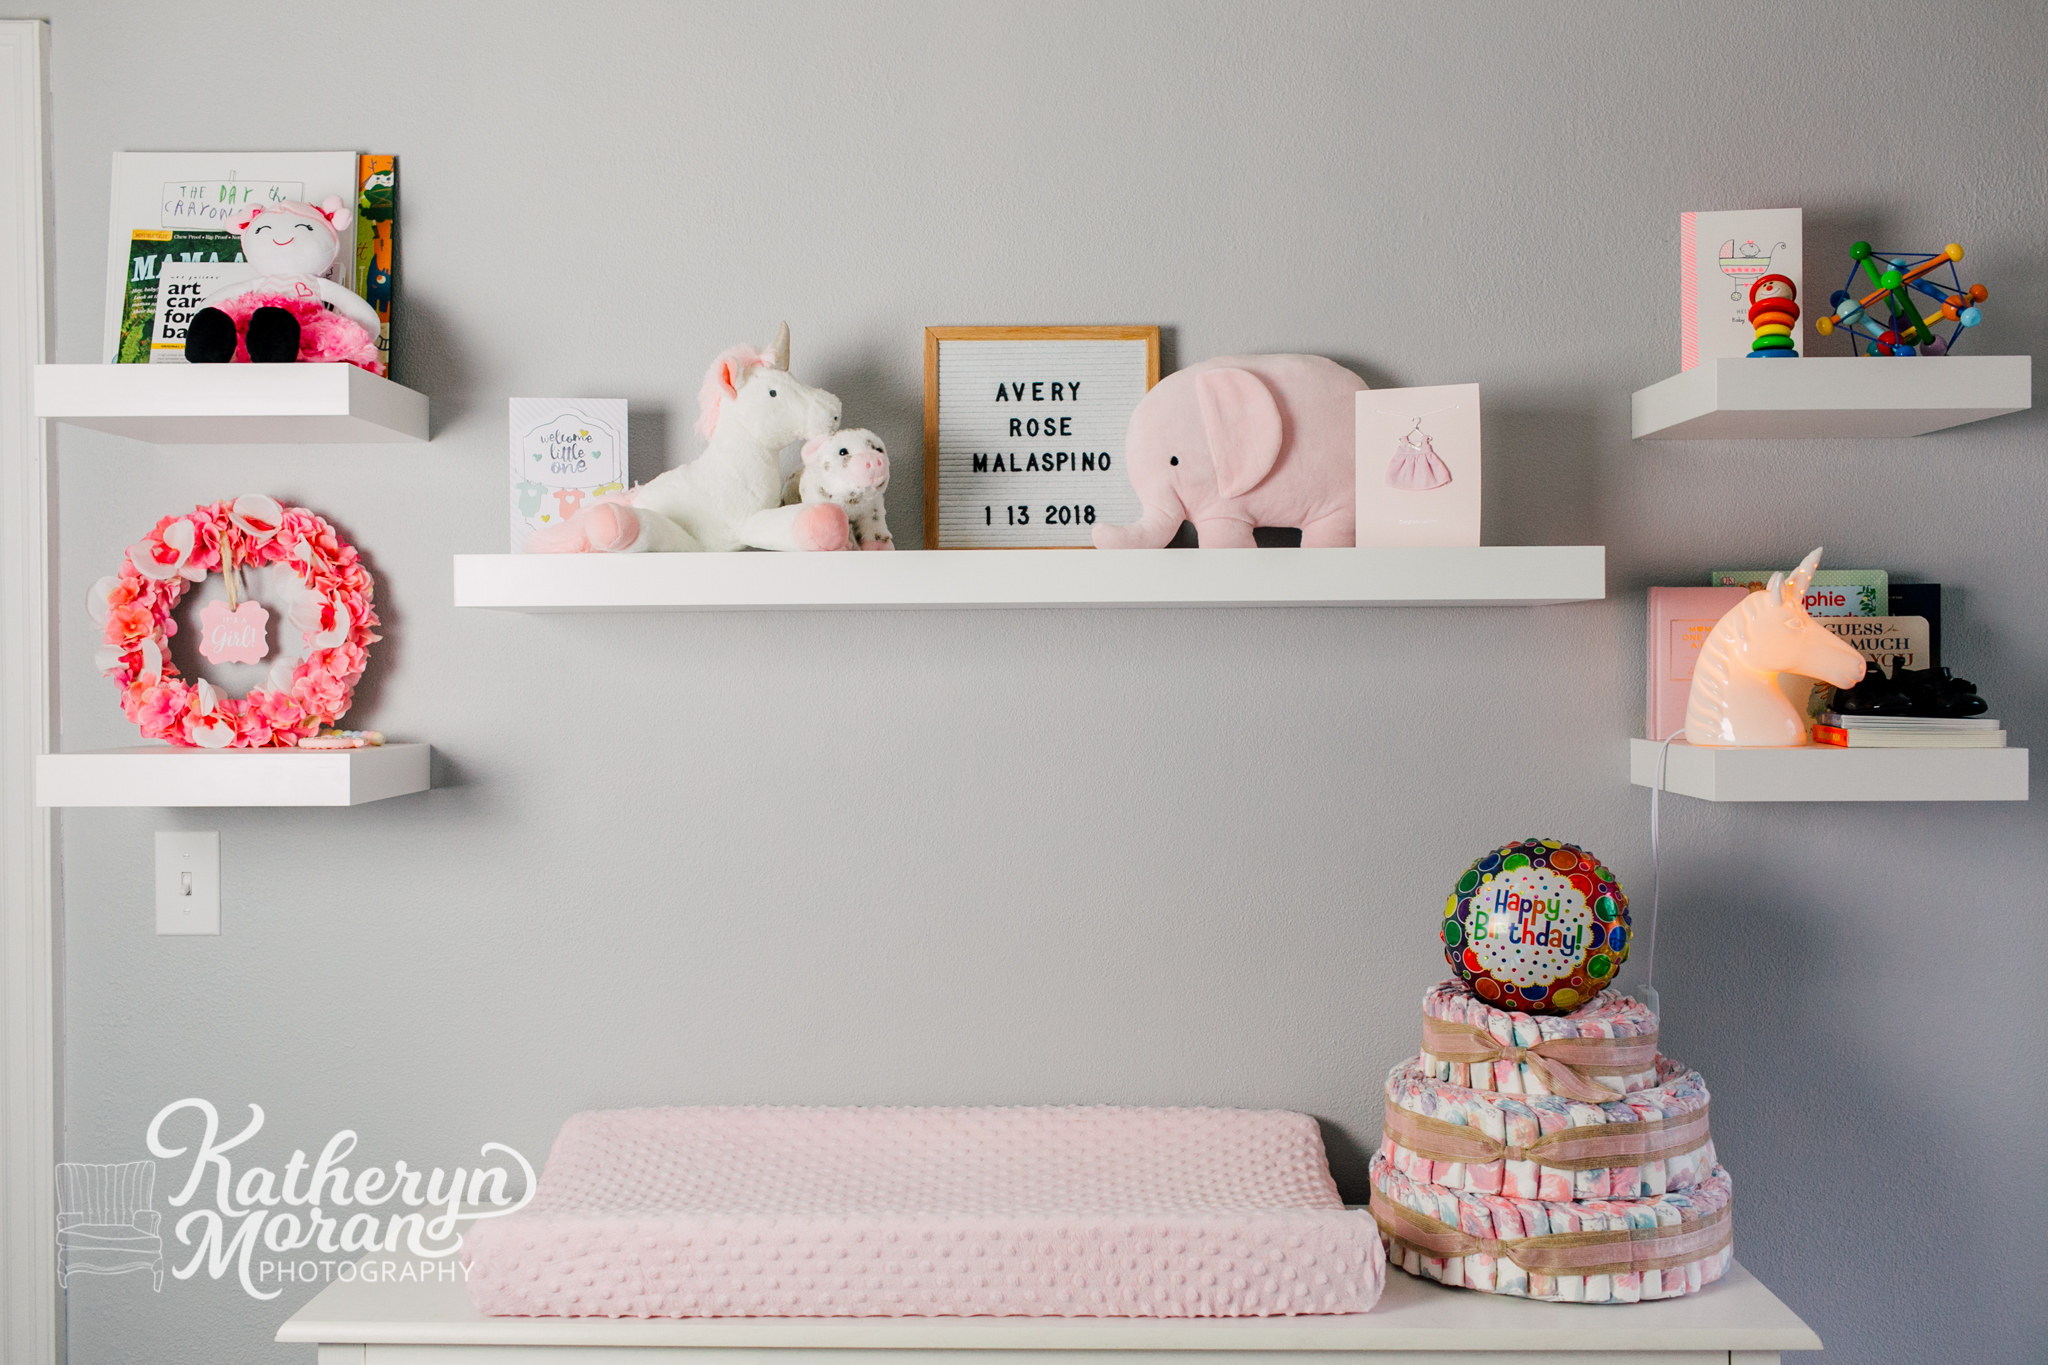 seattle-newborn-photographer-katheryn-moran-avery-malaspino-1-2.jpg